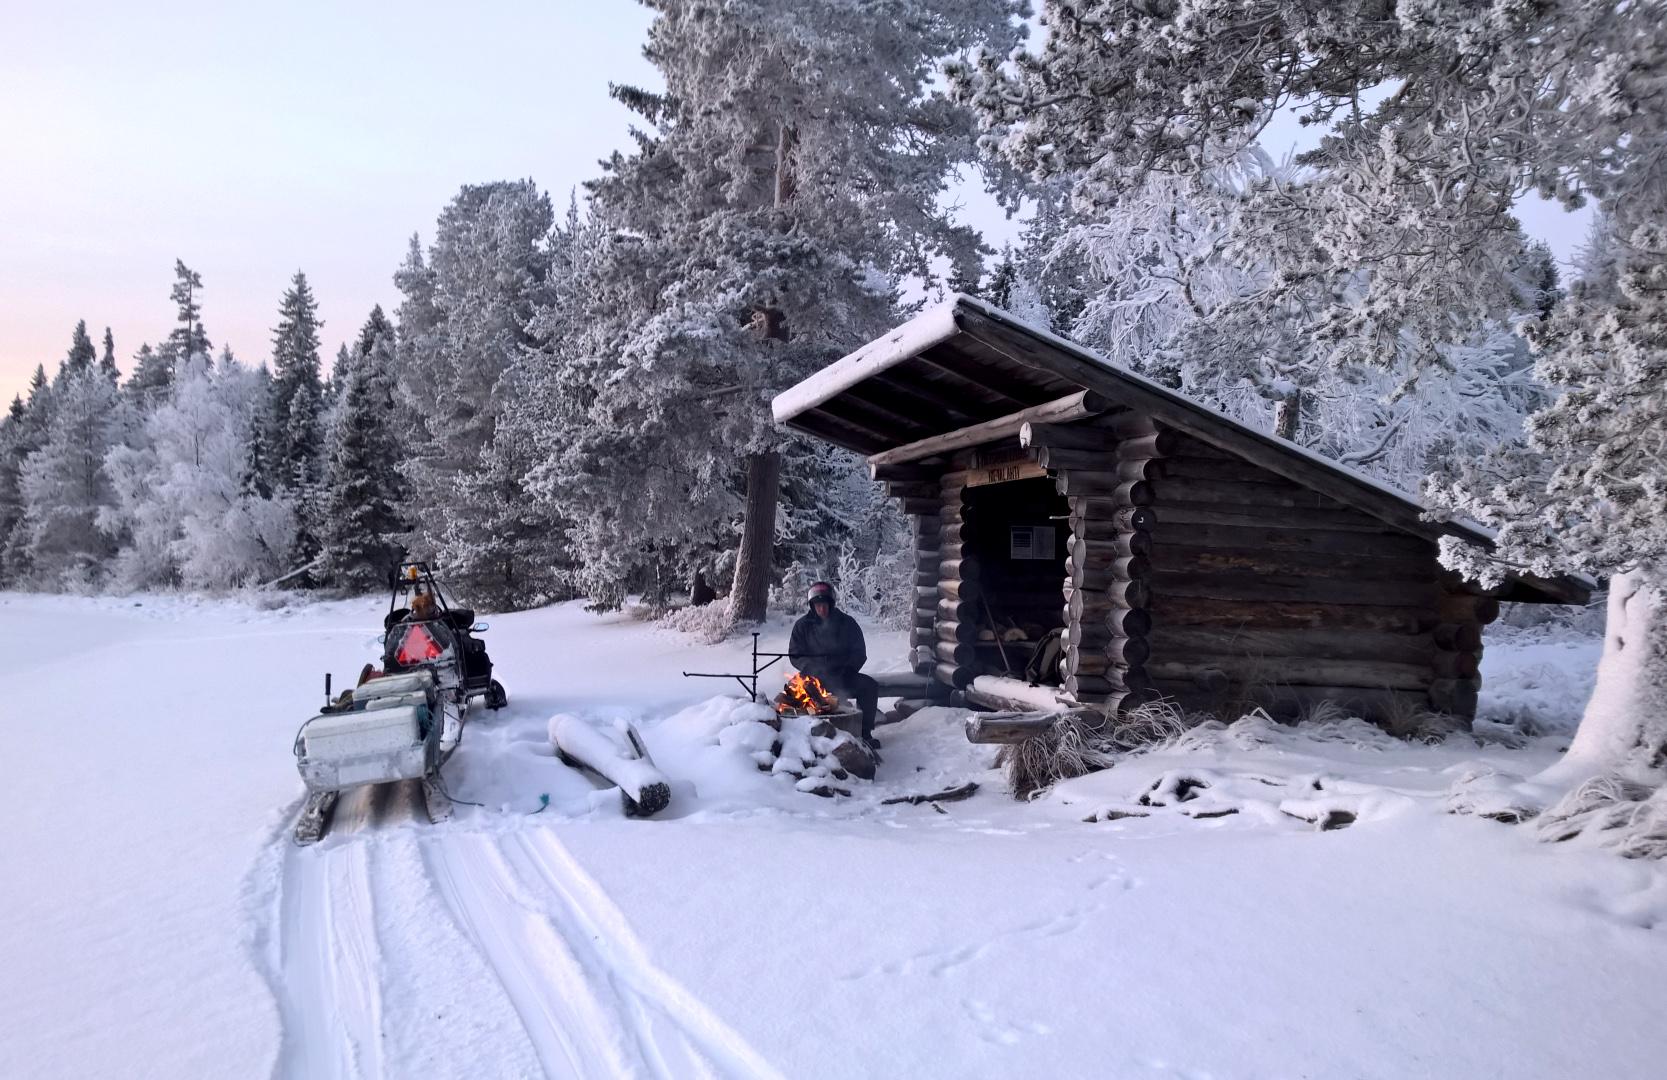 Winter view from Miekojärvi in Pello in Finnish Lapland ...